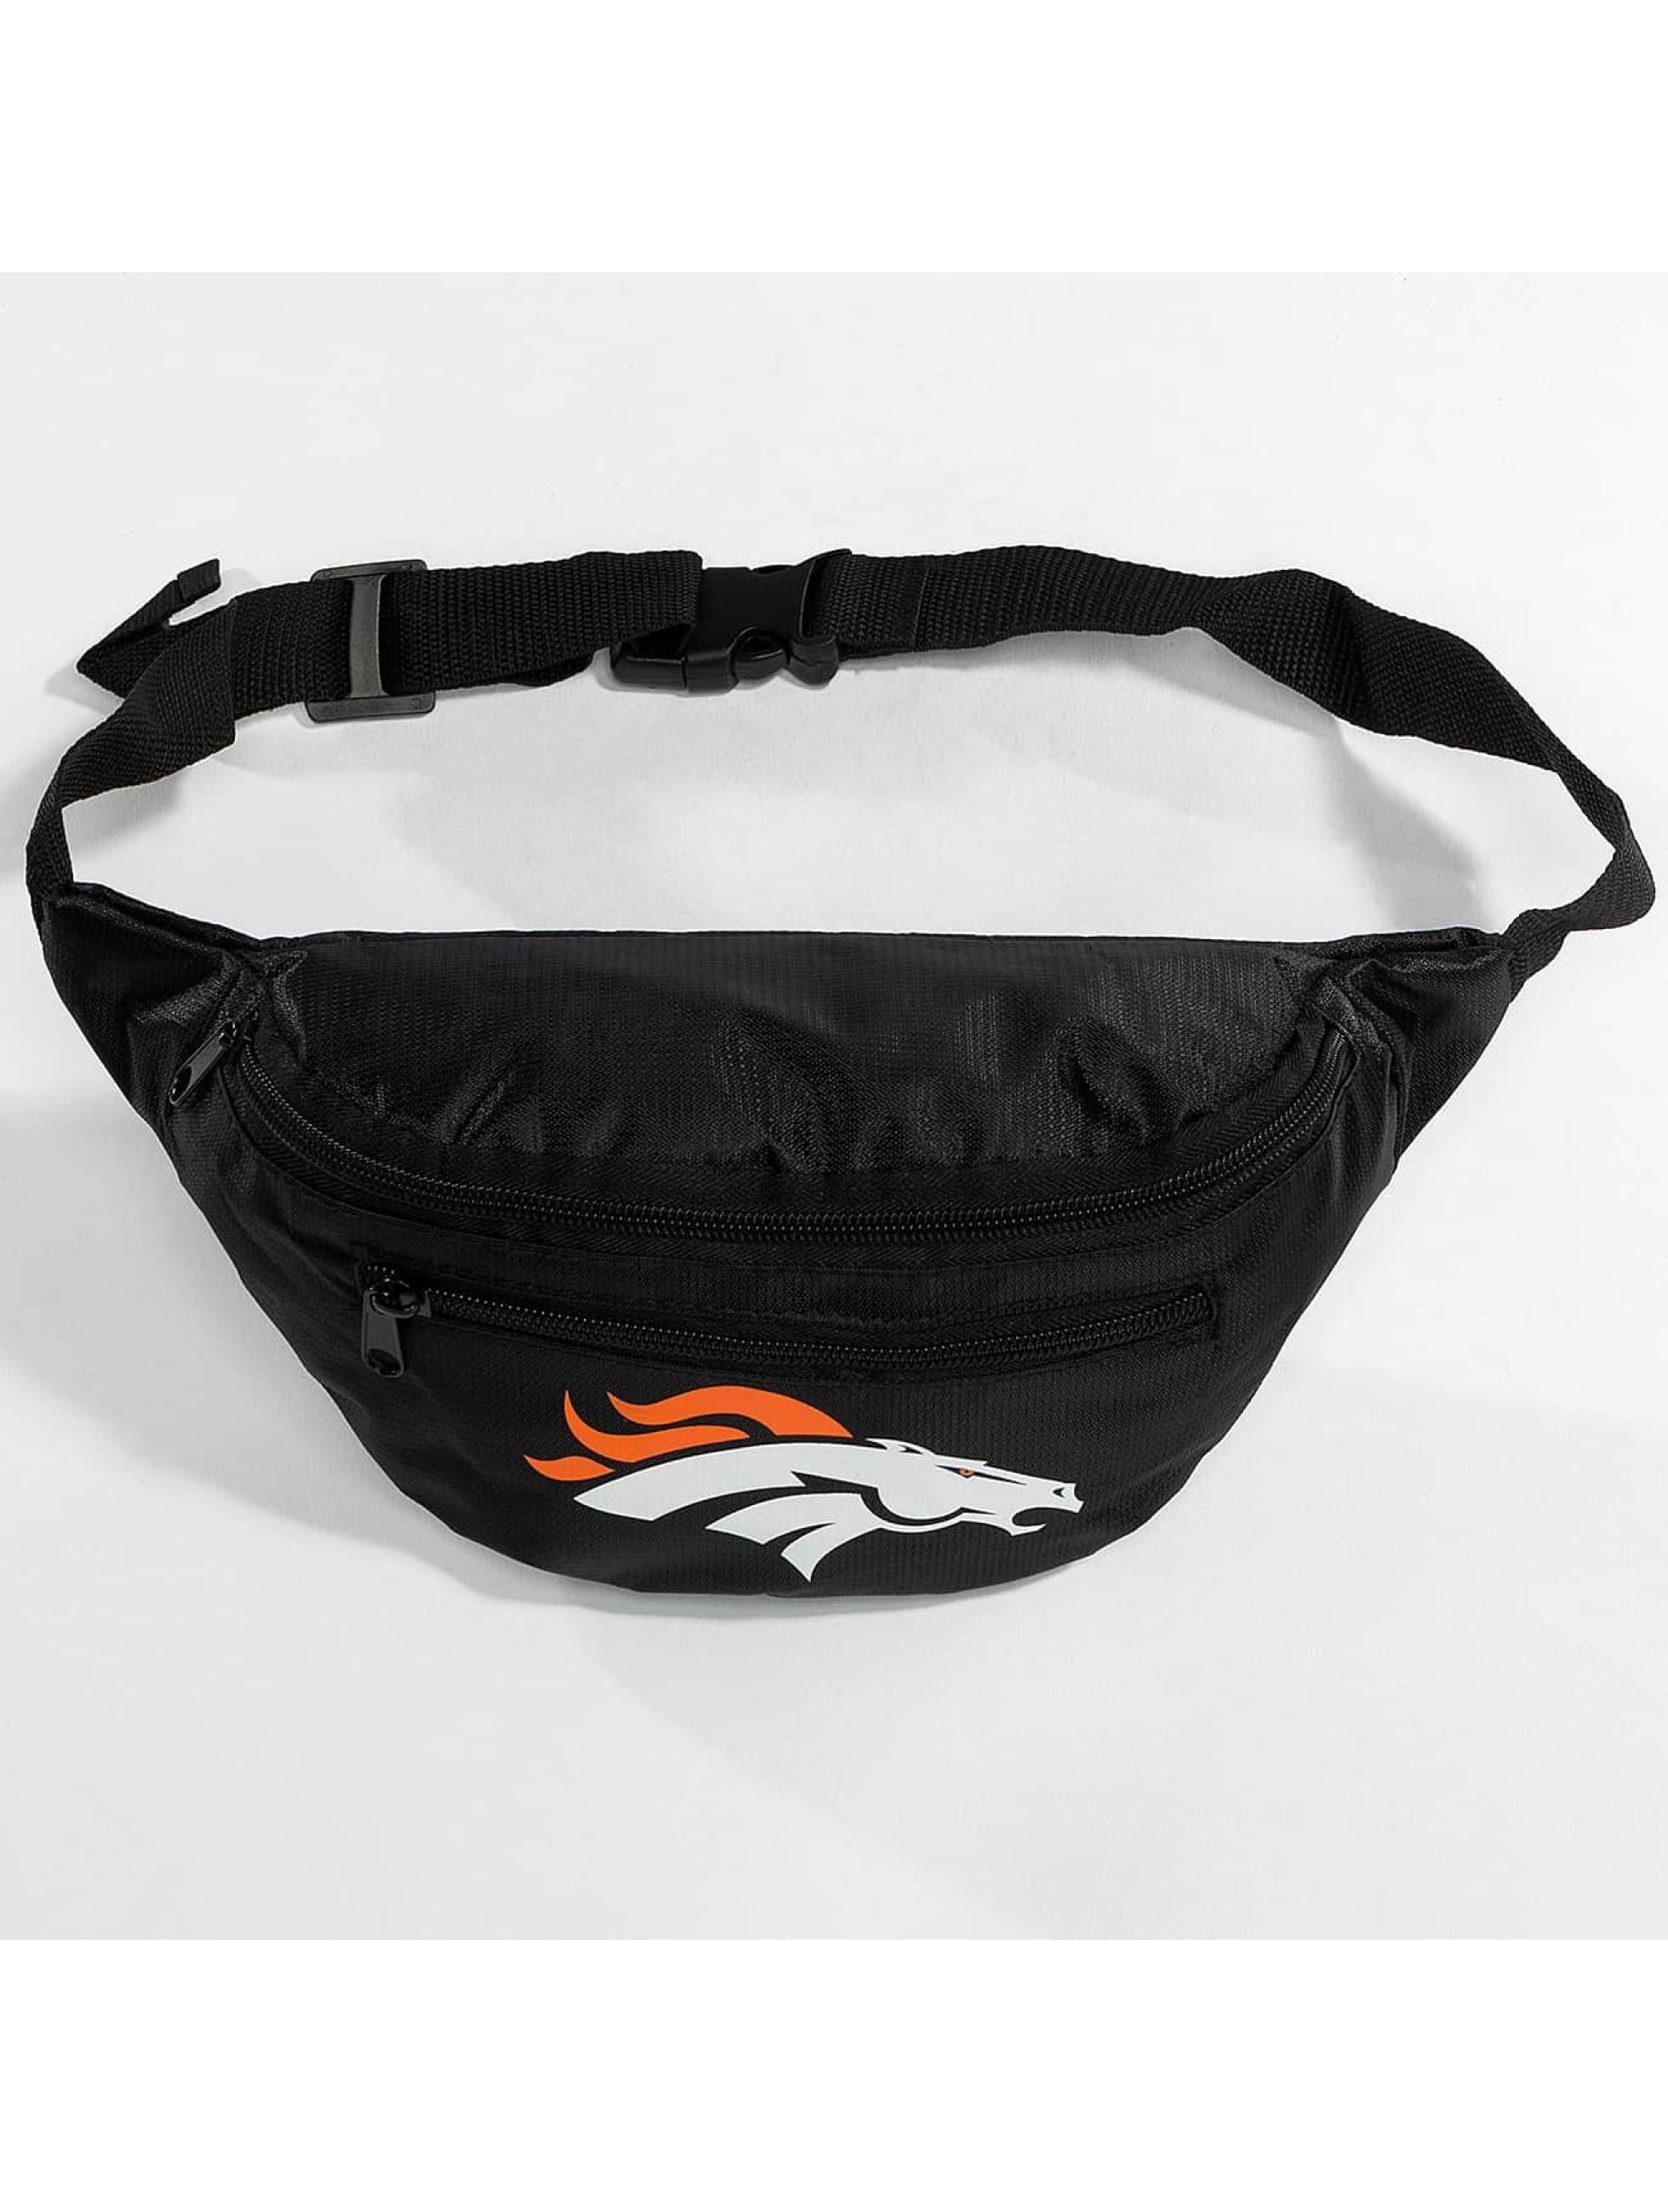 Forever Collectibles Laukut ja treenikassit NFL Denver Broncos musta